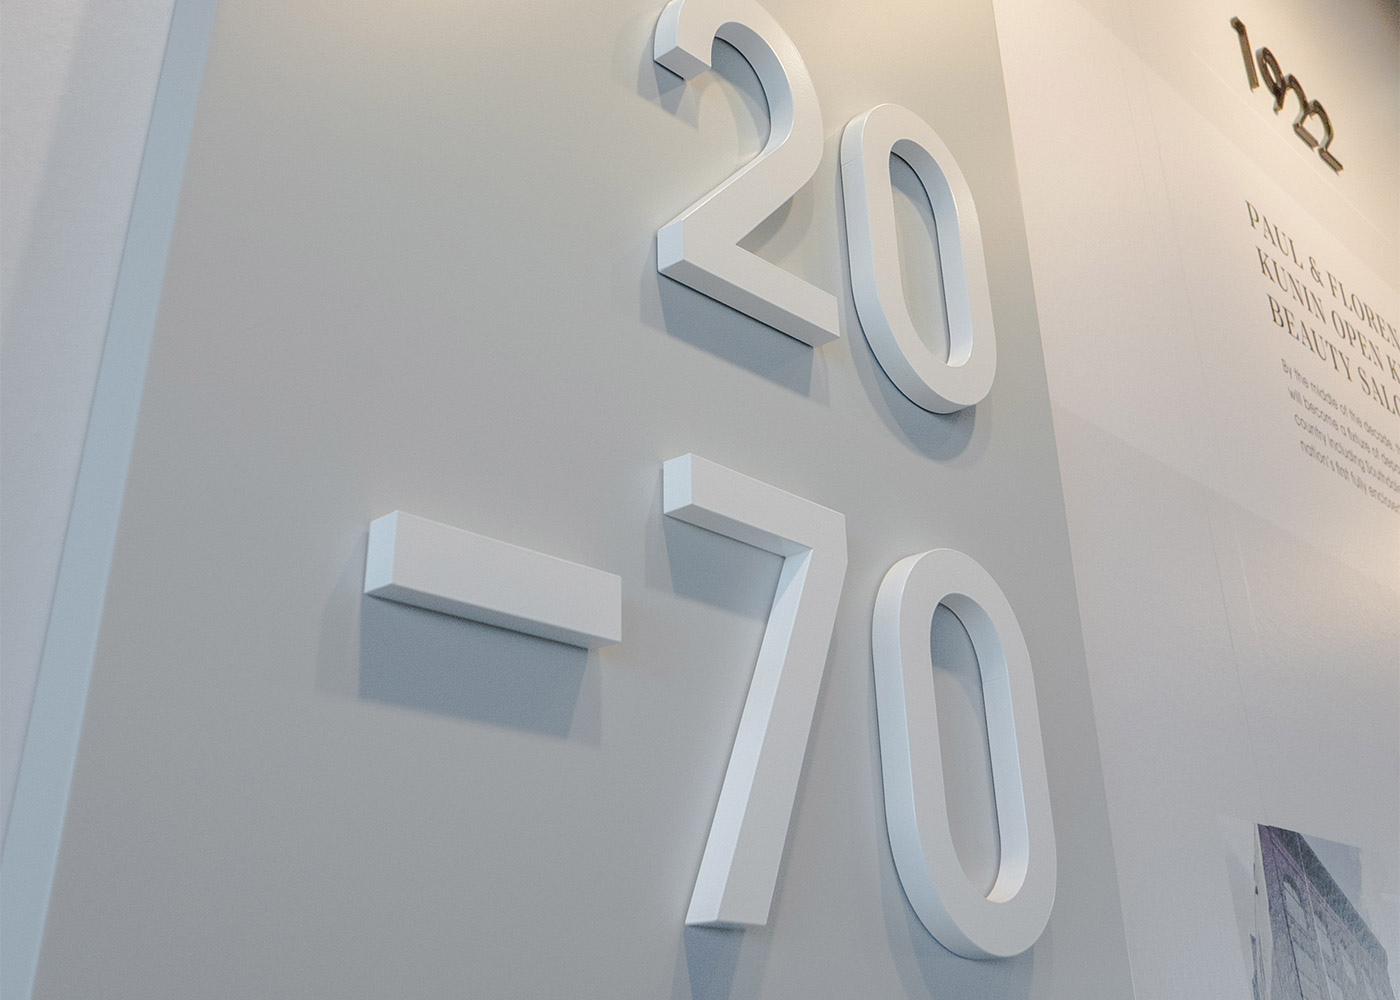 Regis dimensional lettering